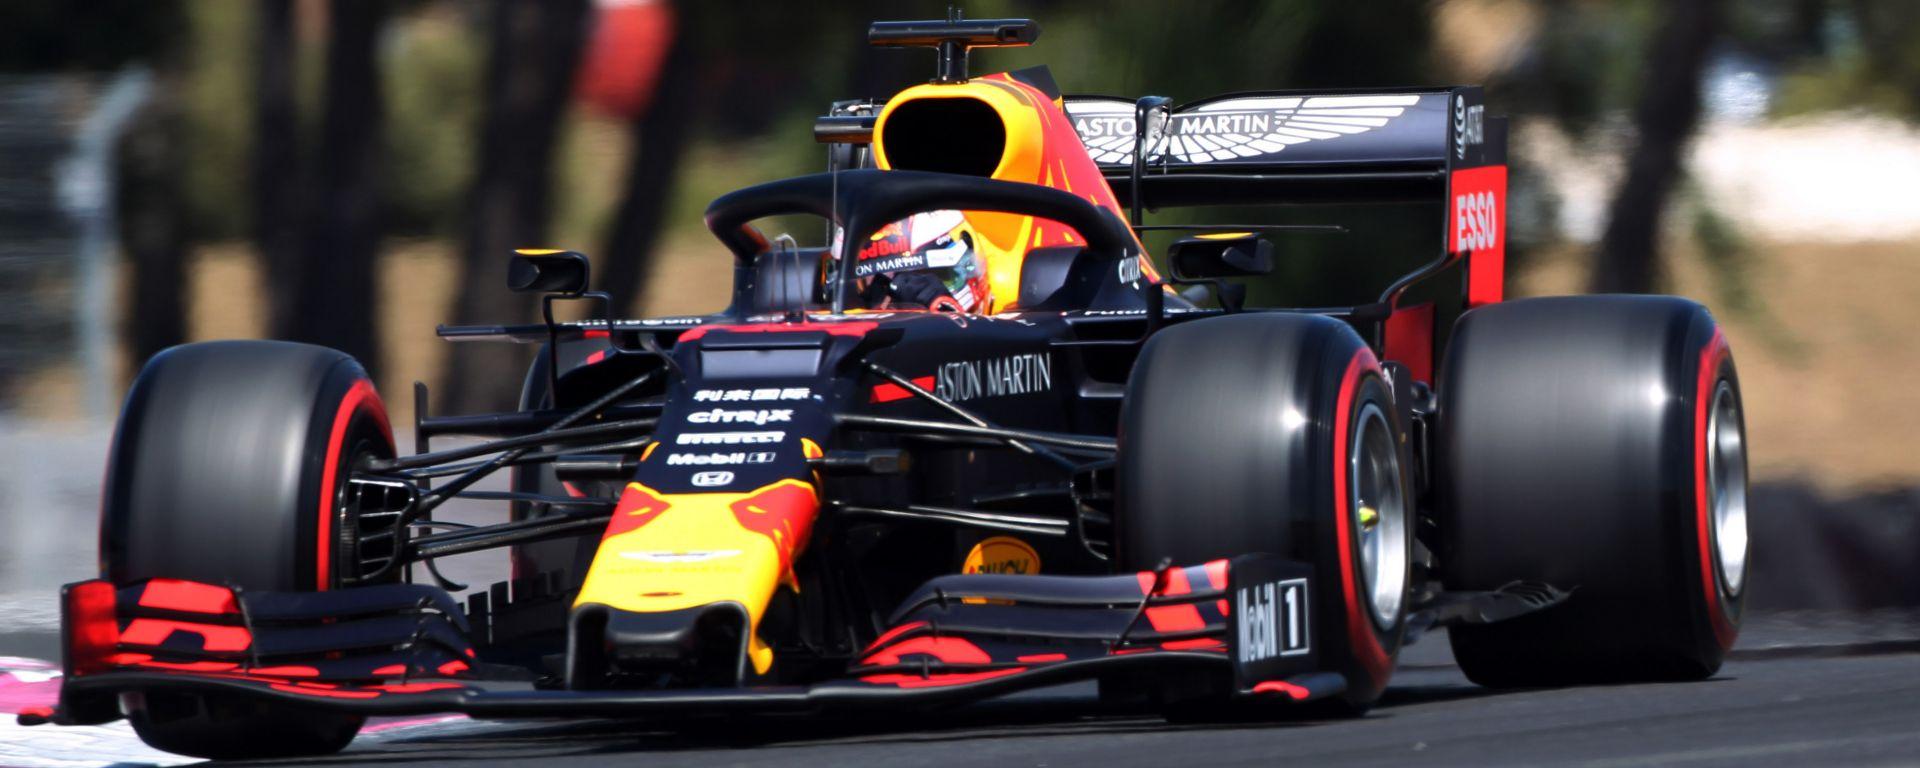 Verstappen nelle qualifiche in Francia